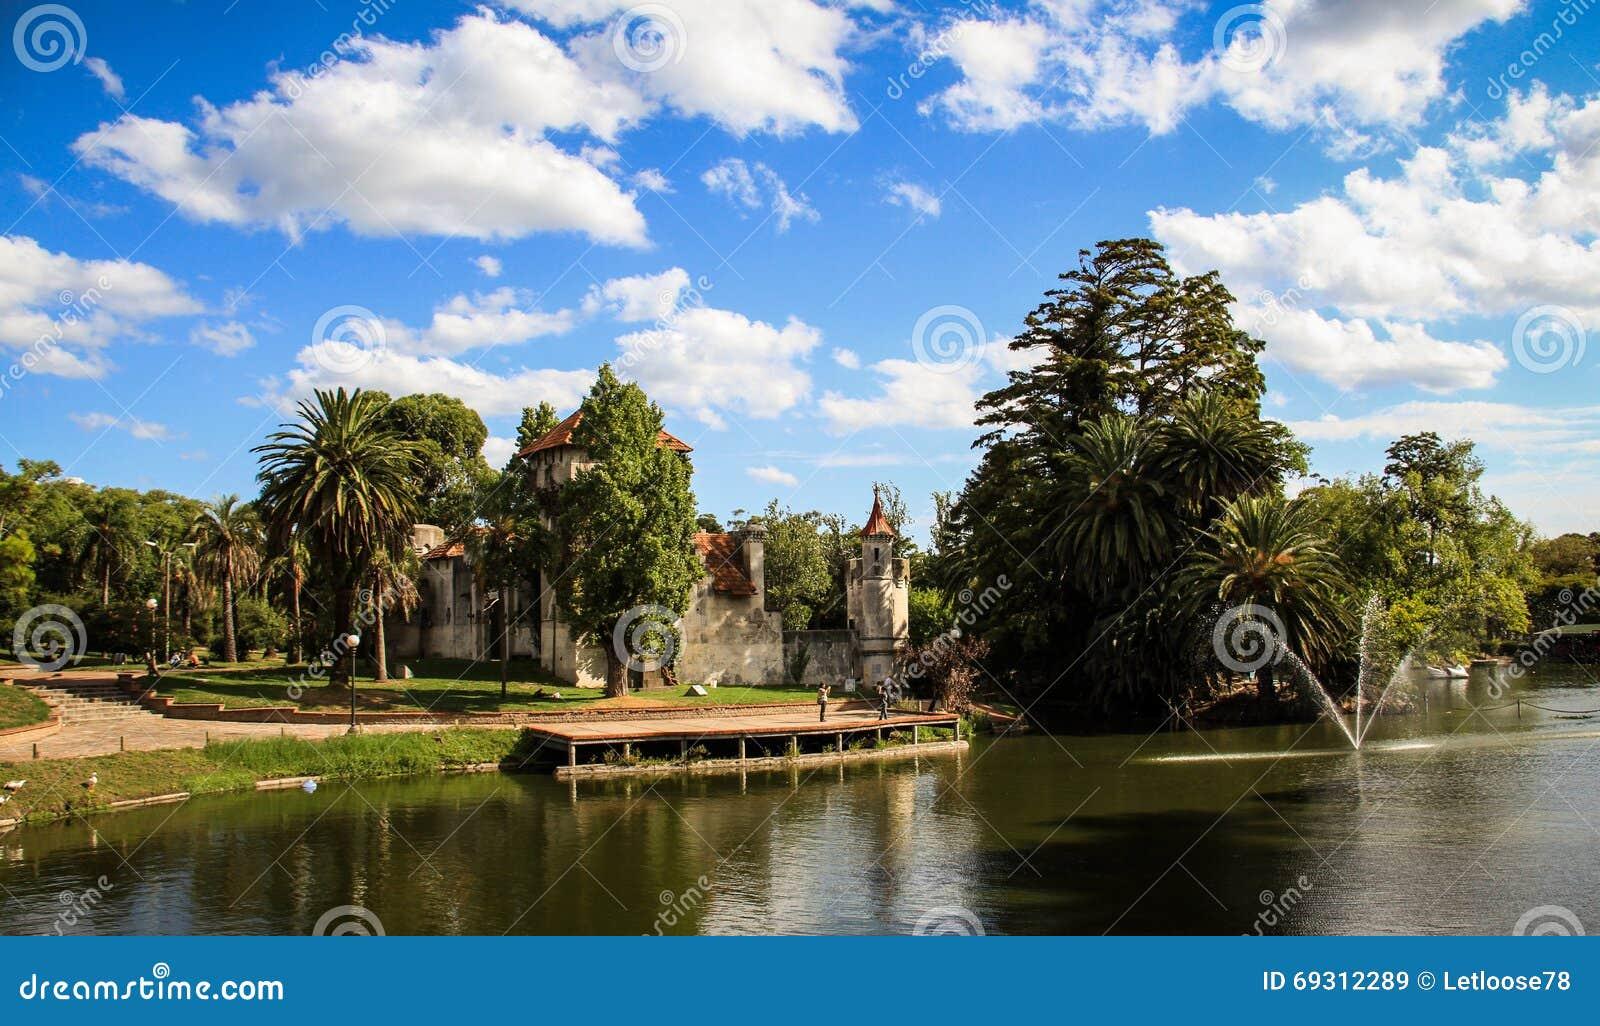 Schloss und See des Rodo-Parks, Montevideo, Uruguay